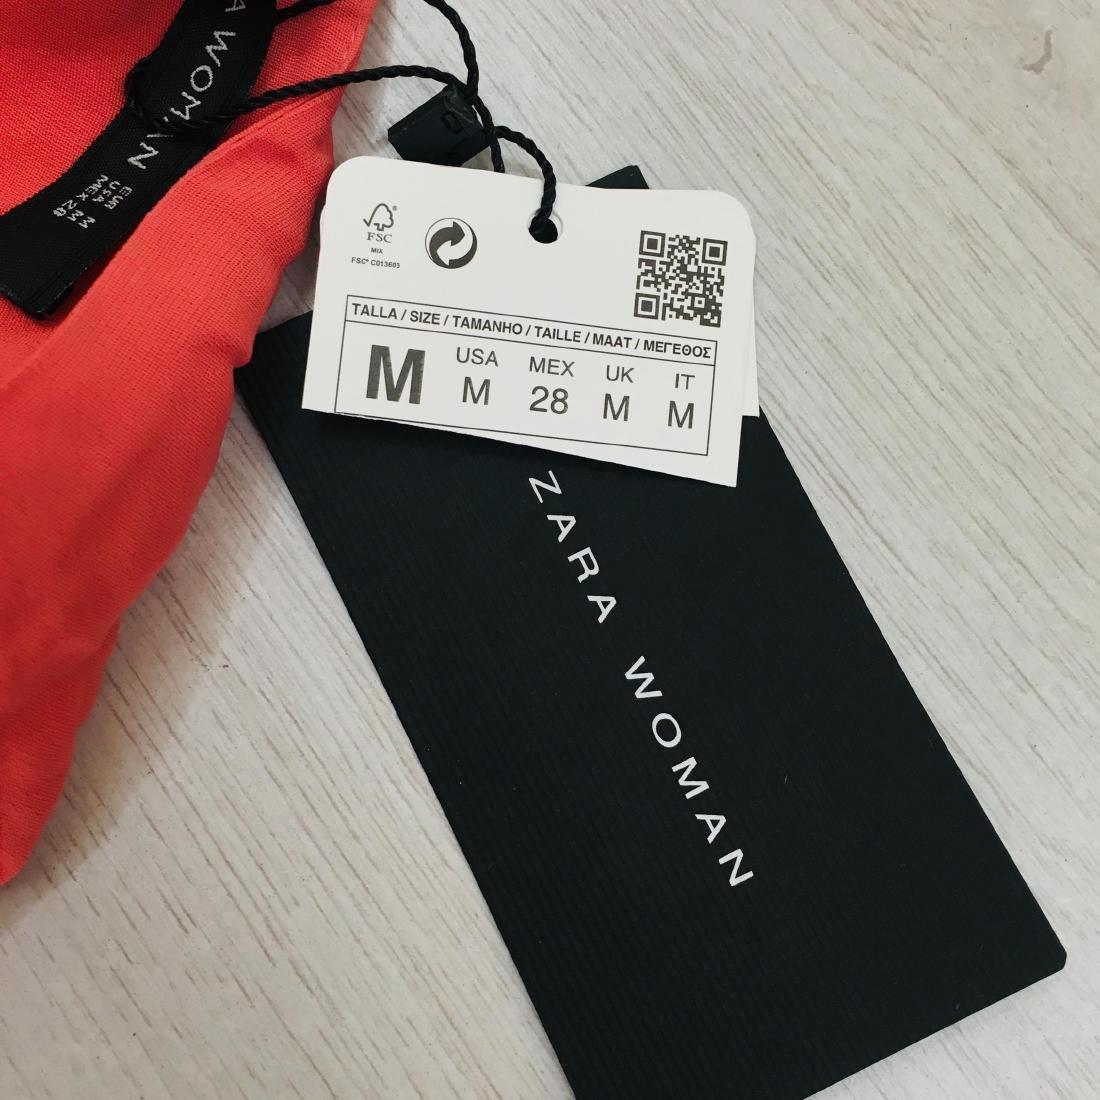 New Women's ZARA Top Blouse Size M - 8